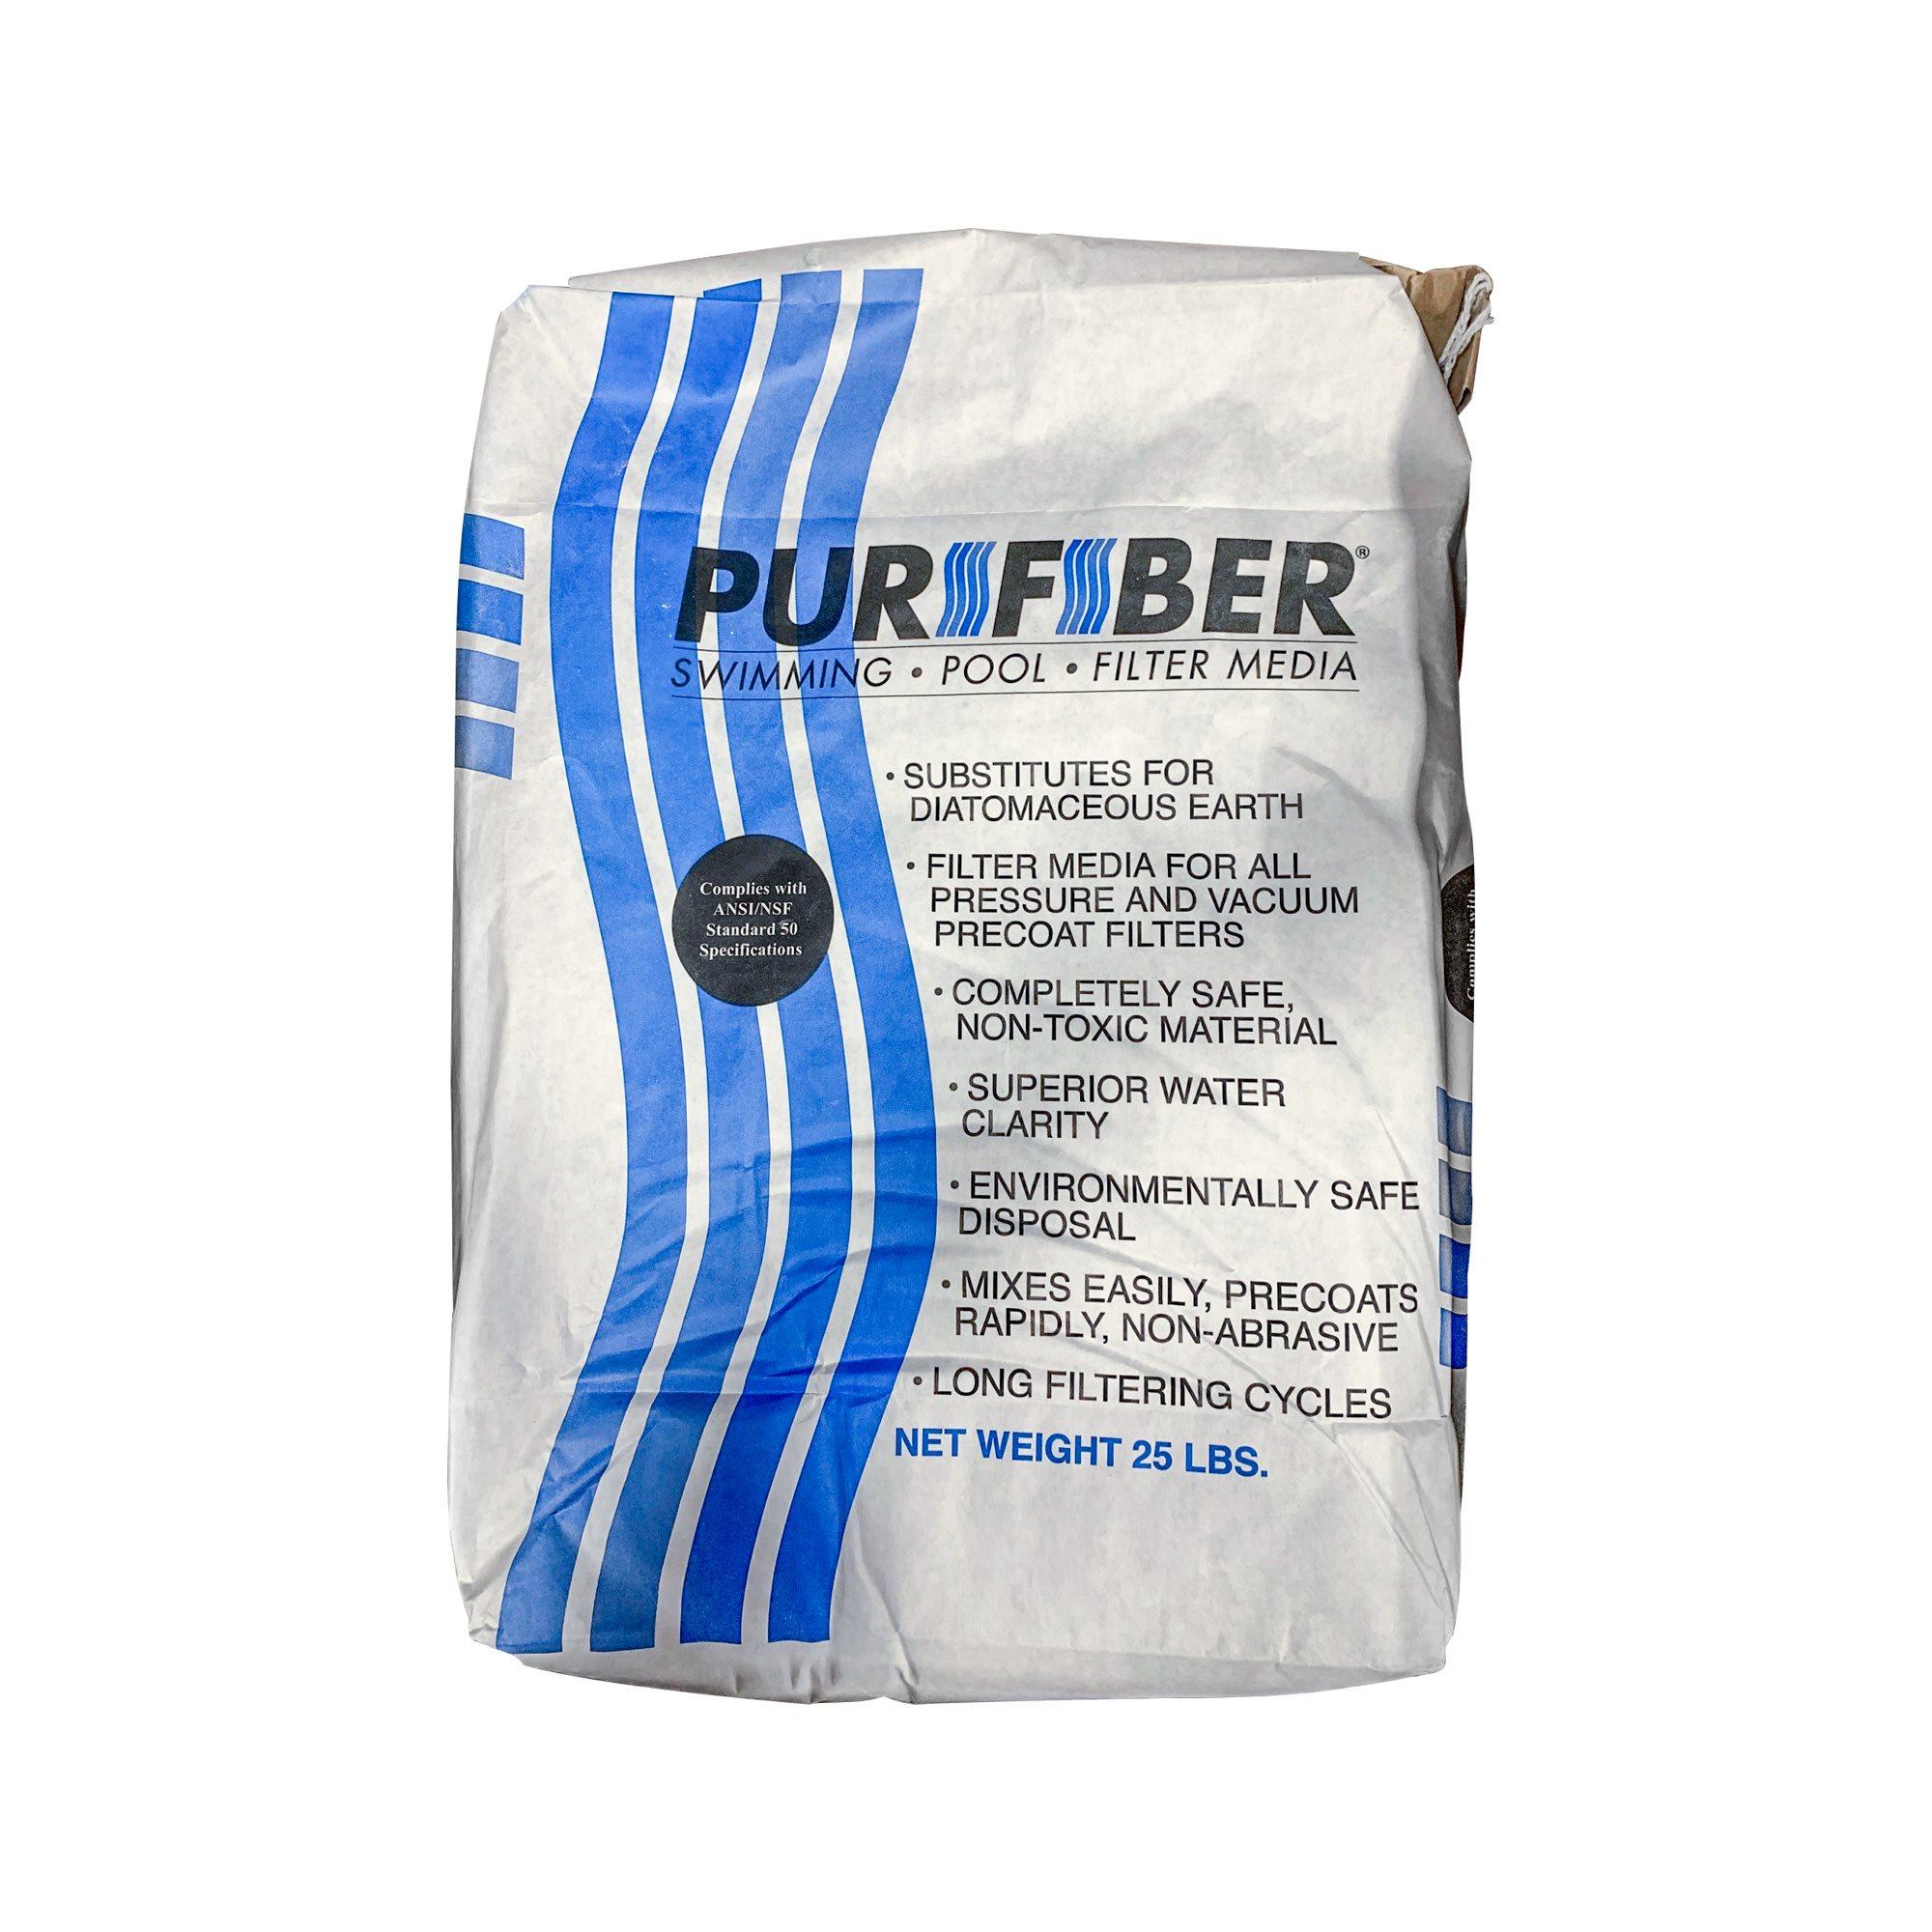 Purifiber Cellulose Filter Media 25 Lb